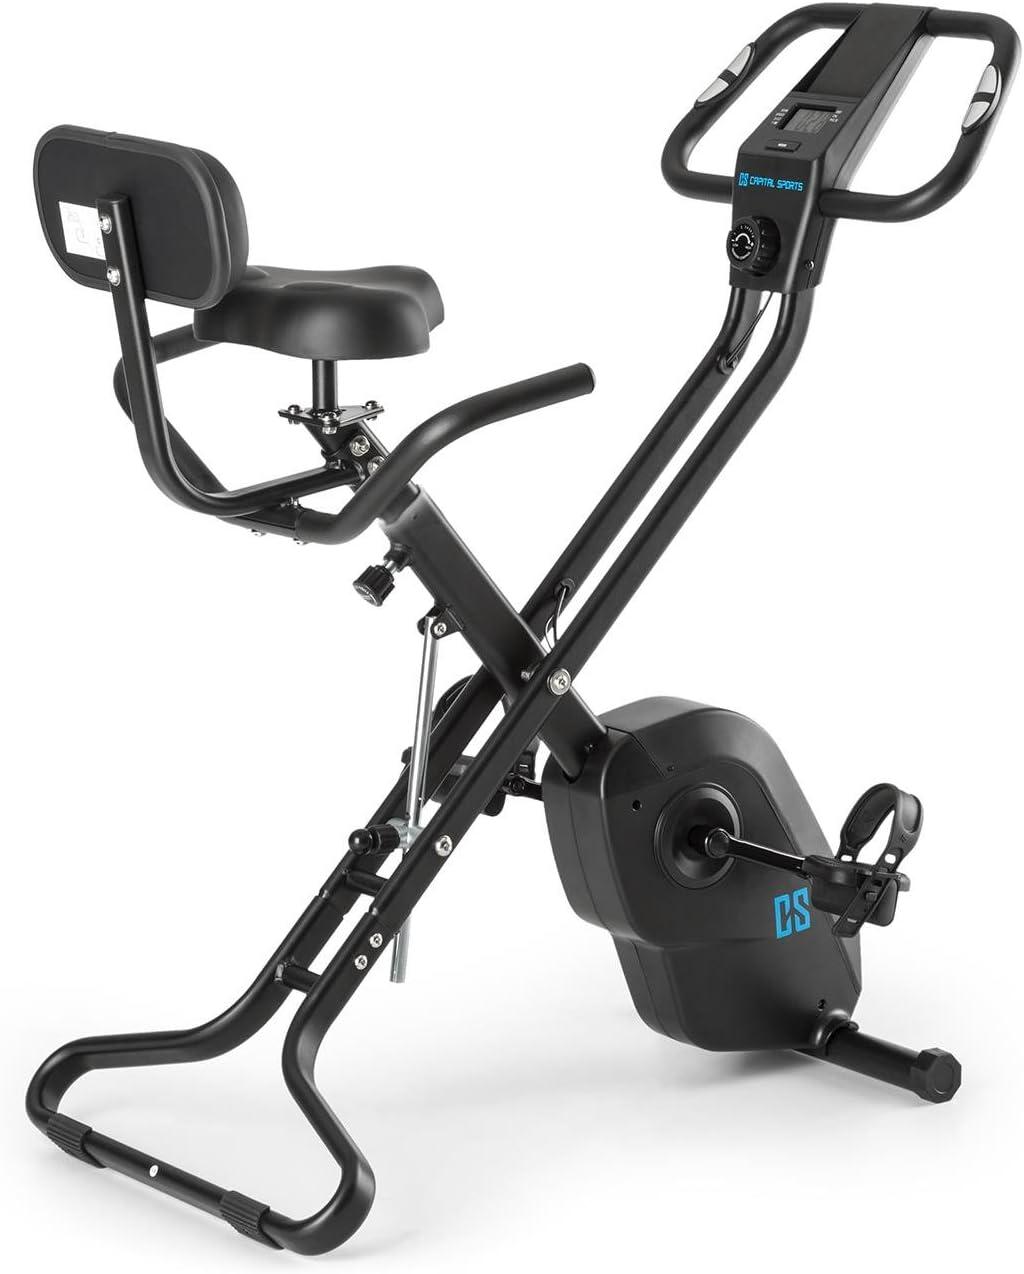 Capital Sports Azura X1 - Bicicleta Fija, Bicicleta estática de Cardio, medidor de Pulso, Plegable, Peso a rotar de 4 kg, 7 Alturas, Respaldo, Soportes Laterales, máx. 120 kg, Negro